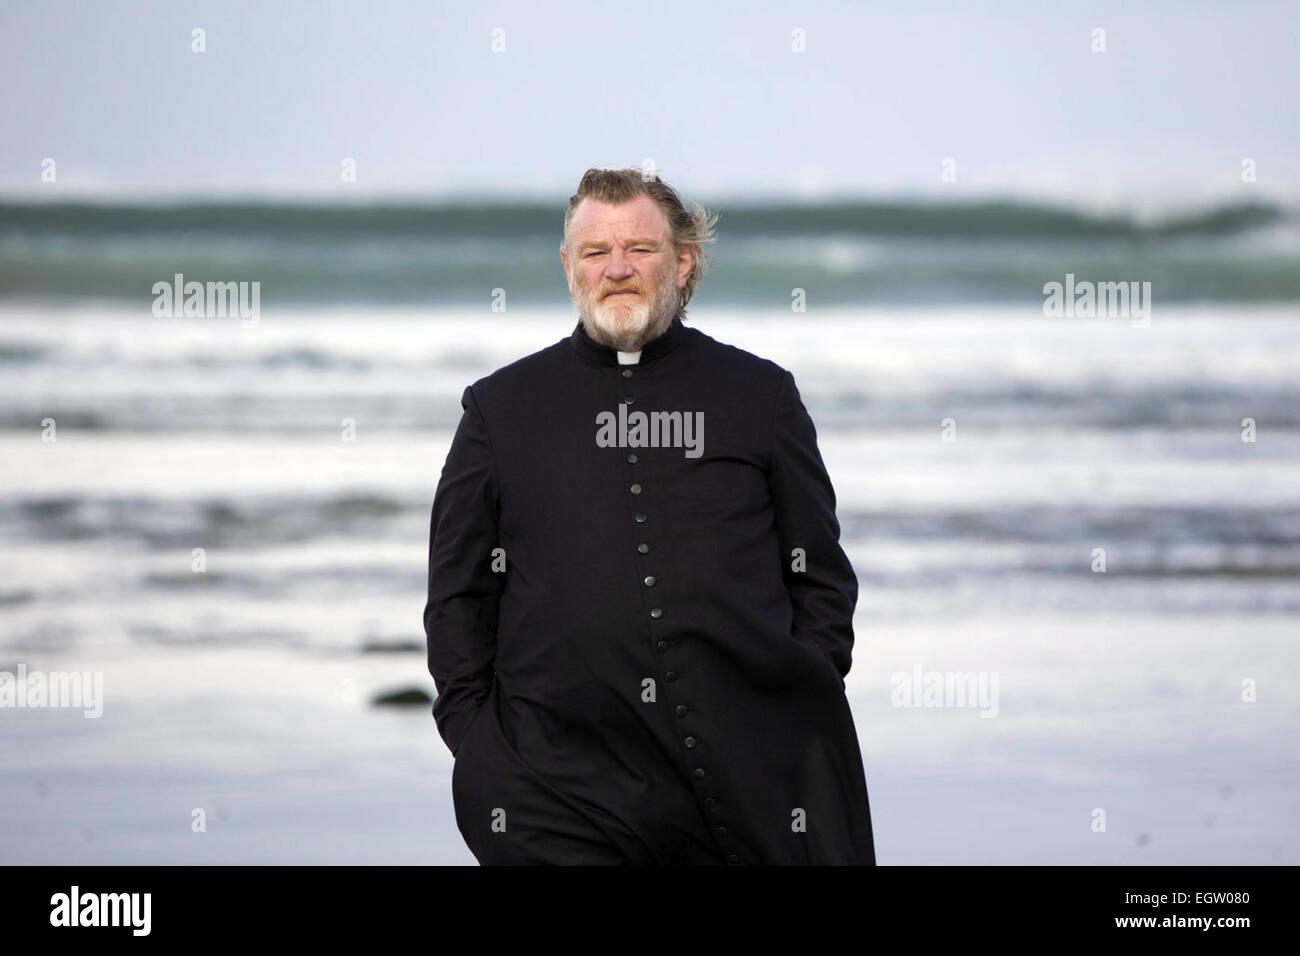 Calvary is a 2014 Irish drama film written and directed by John Michael McDonagh. The film stars Brendan Gleeson, - Stock Image